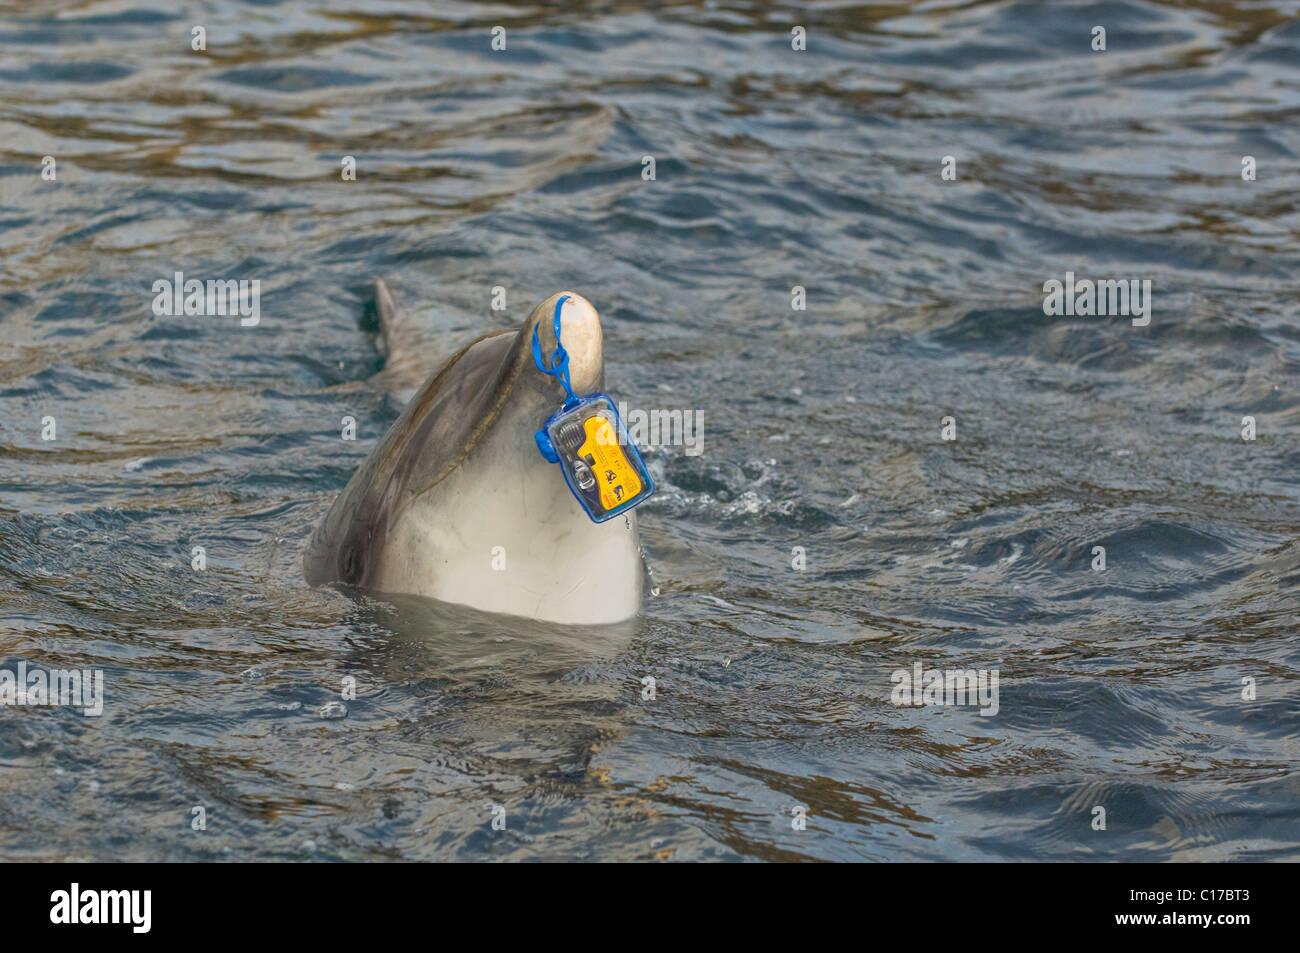 Wild solitary sociable or interactive Bottlenose dolphin Dusty (Tursiops truncatus) Co Clare, Ireland. - Stock Image